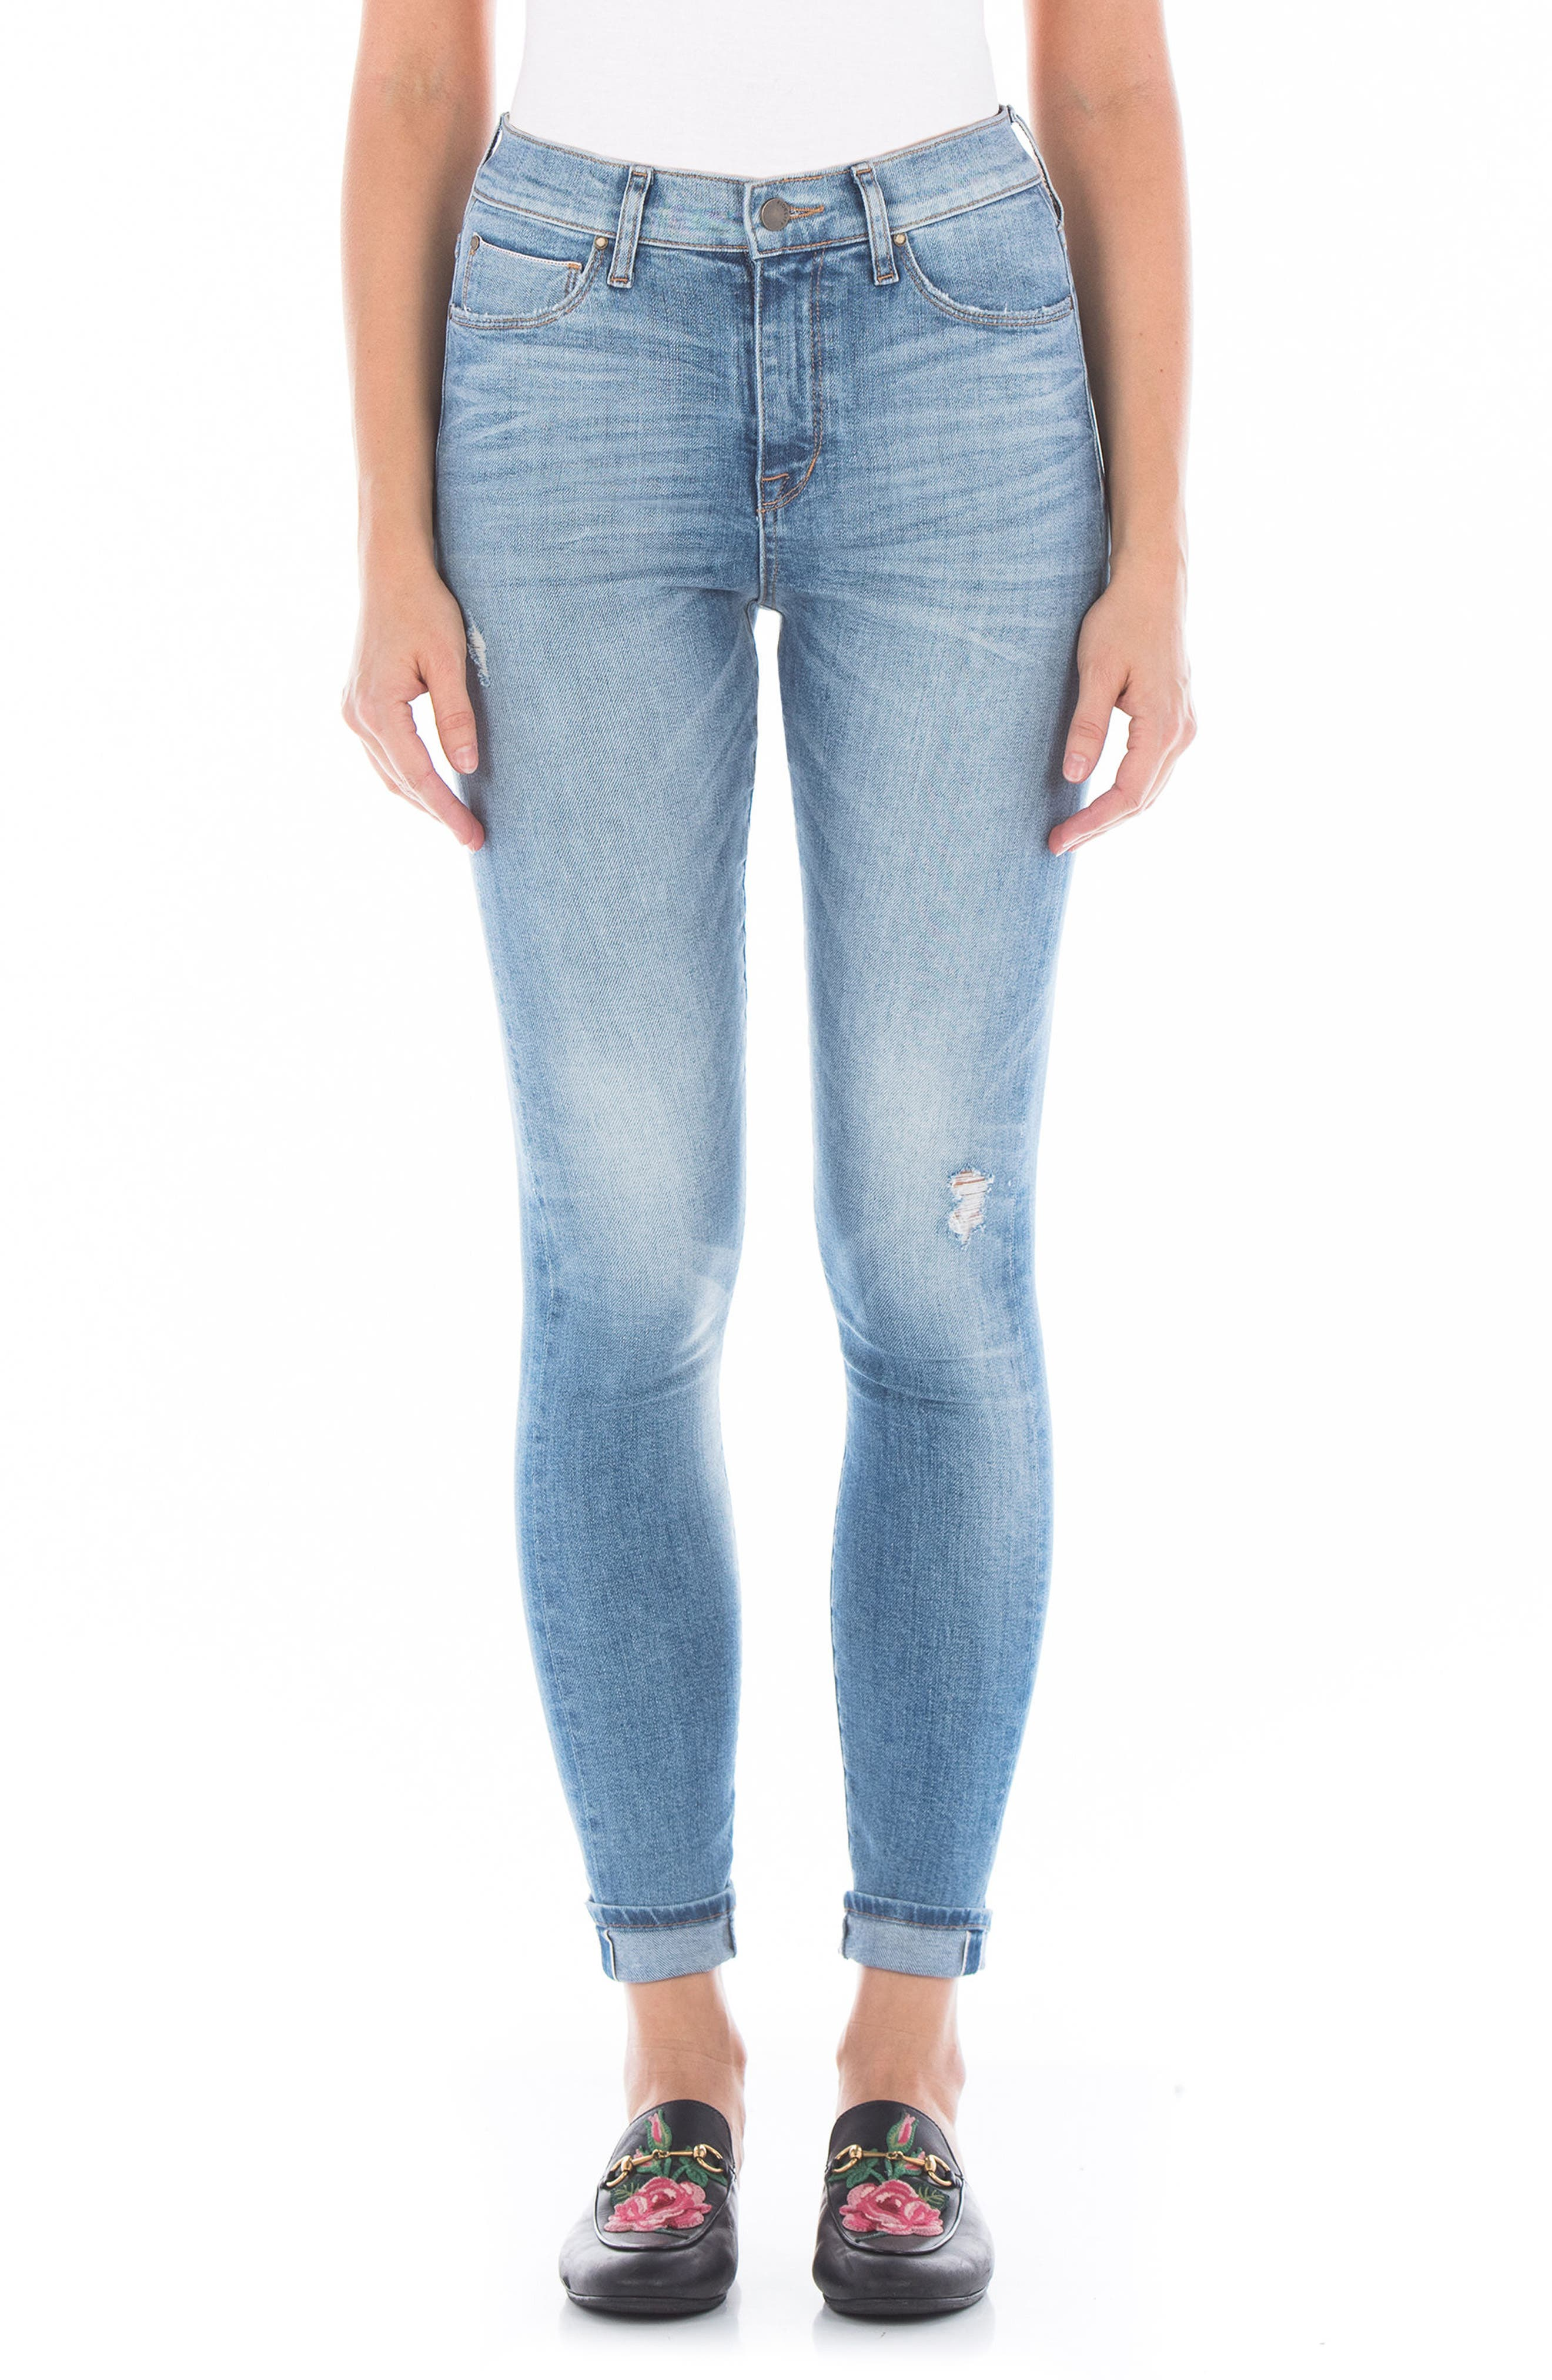 Gwen High Waist Skinny Jeans,                             Main thumbnail 1, color,                             76 SUMMER